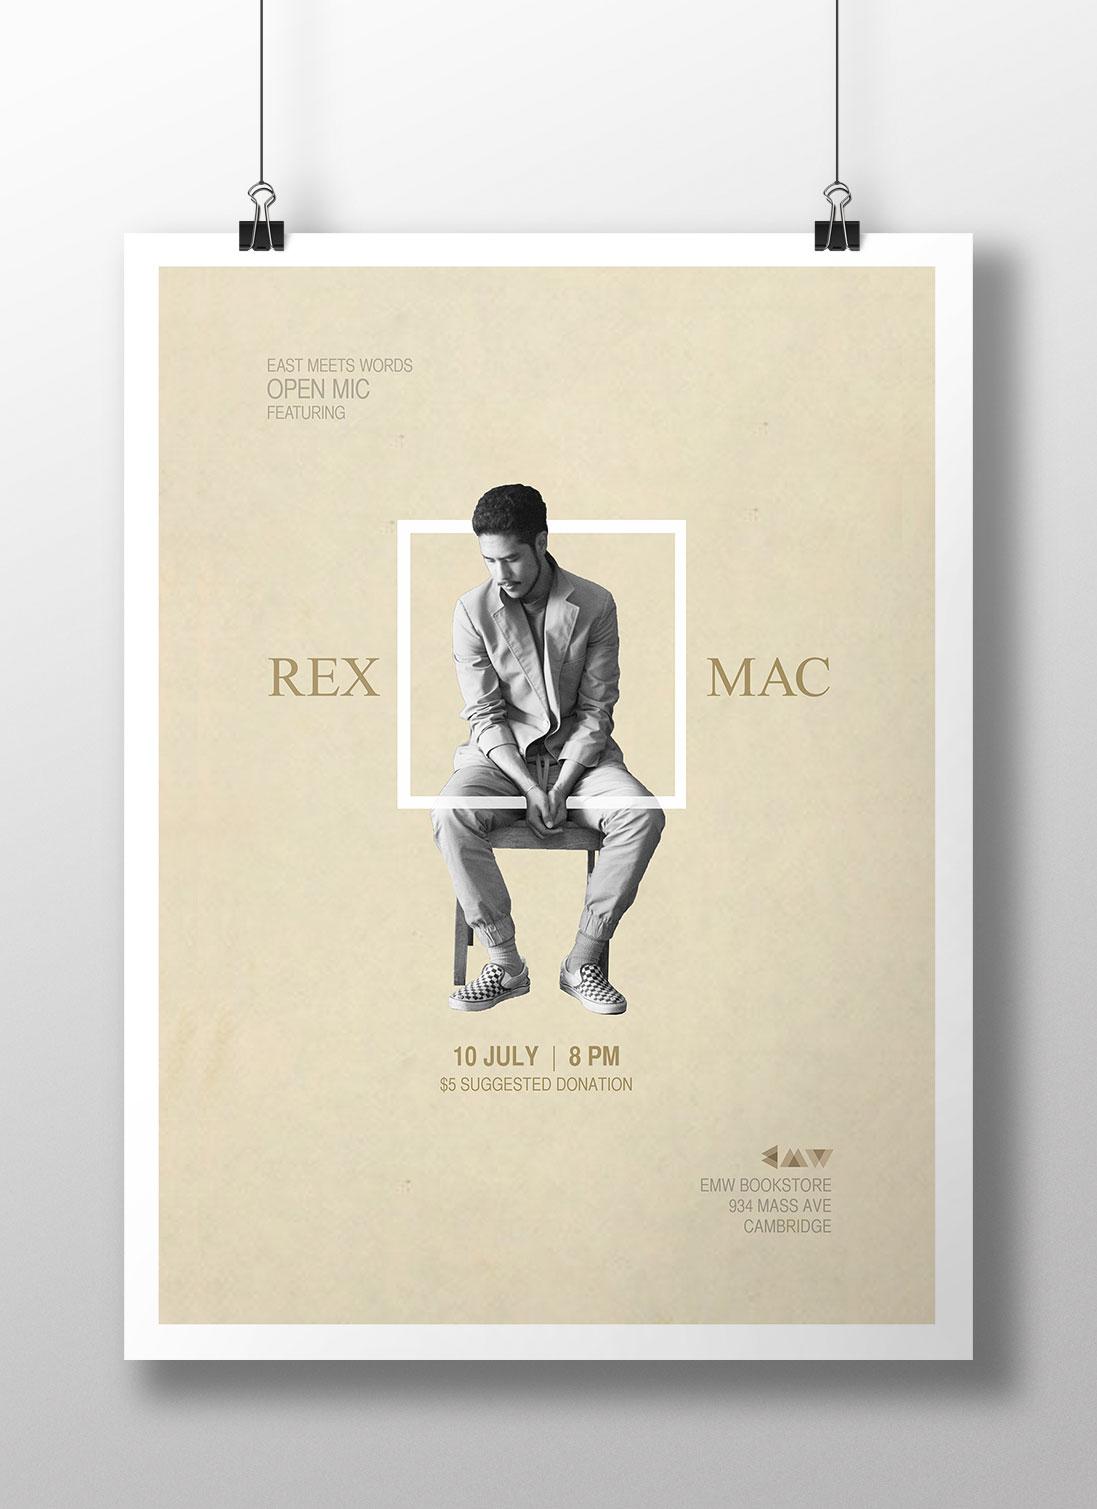 Rex-EMW-Poster_WEB.jpg